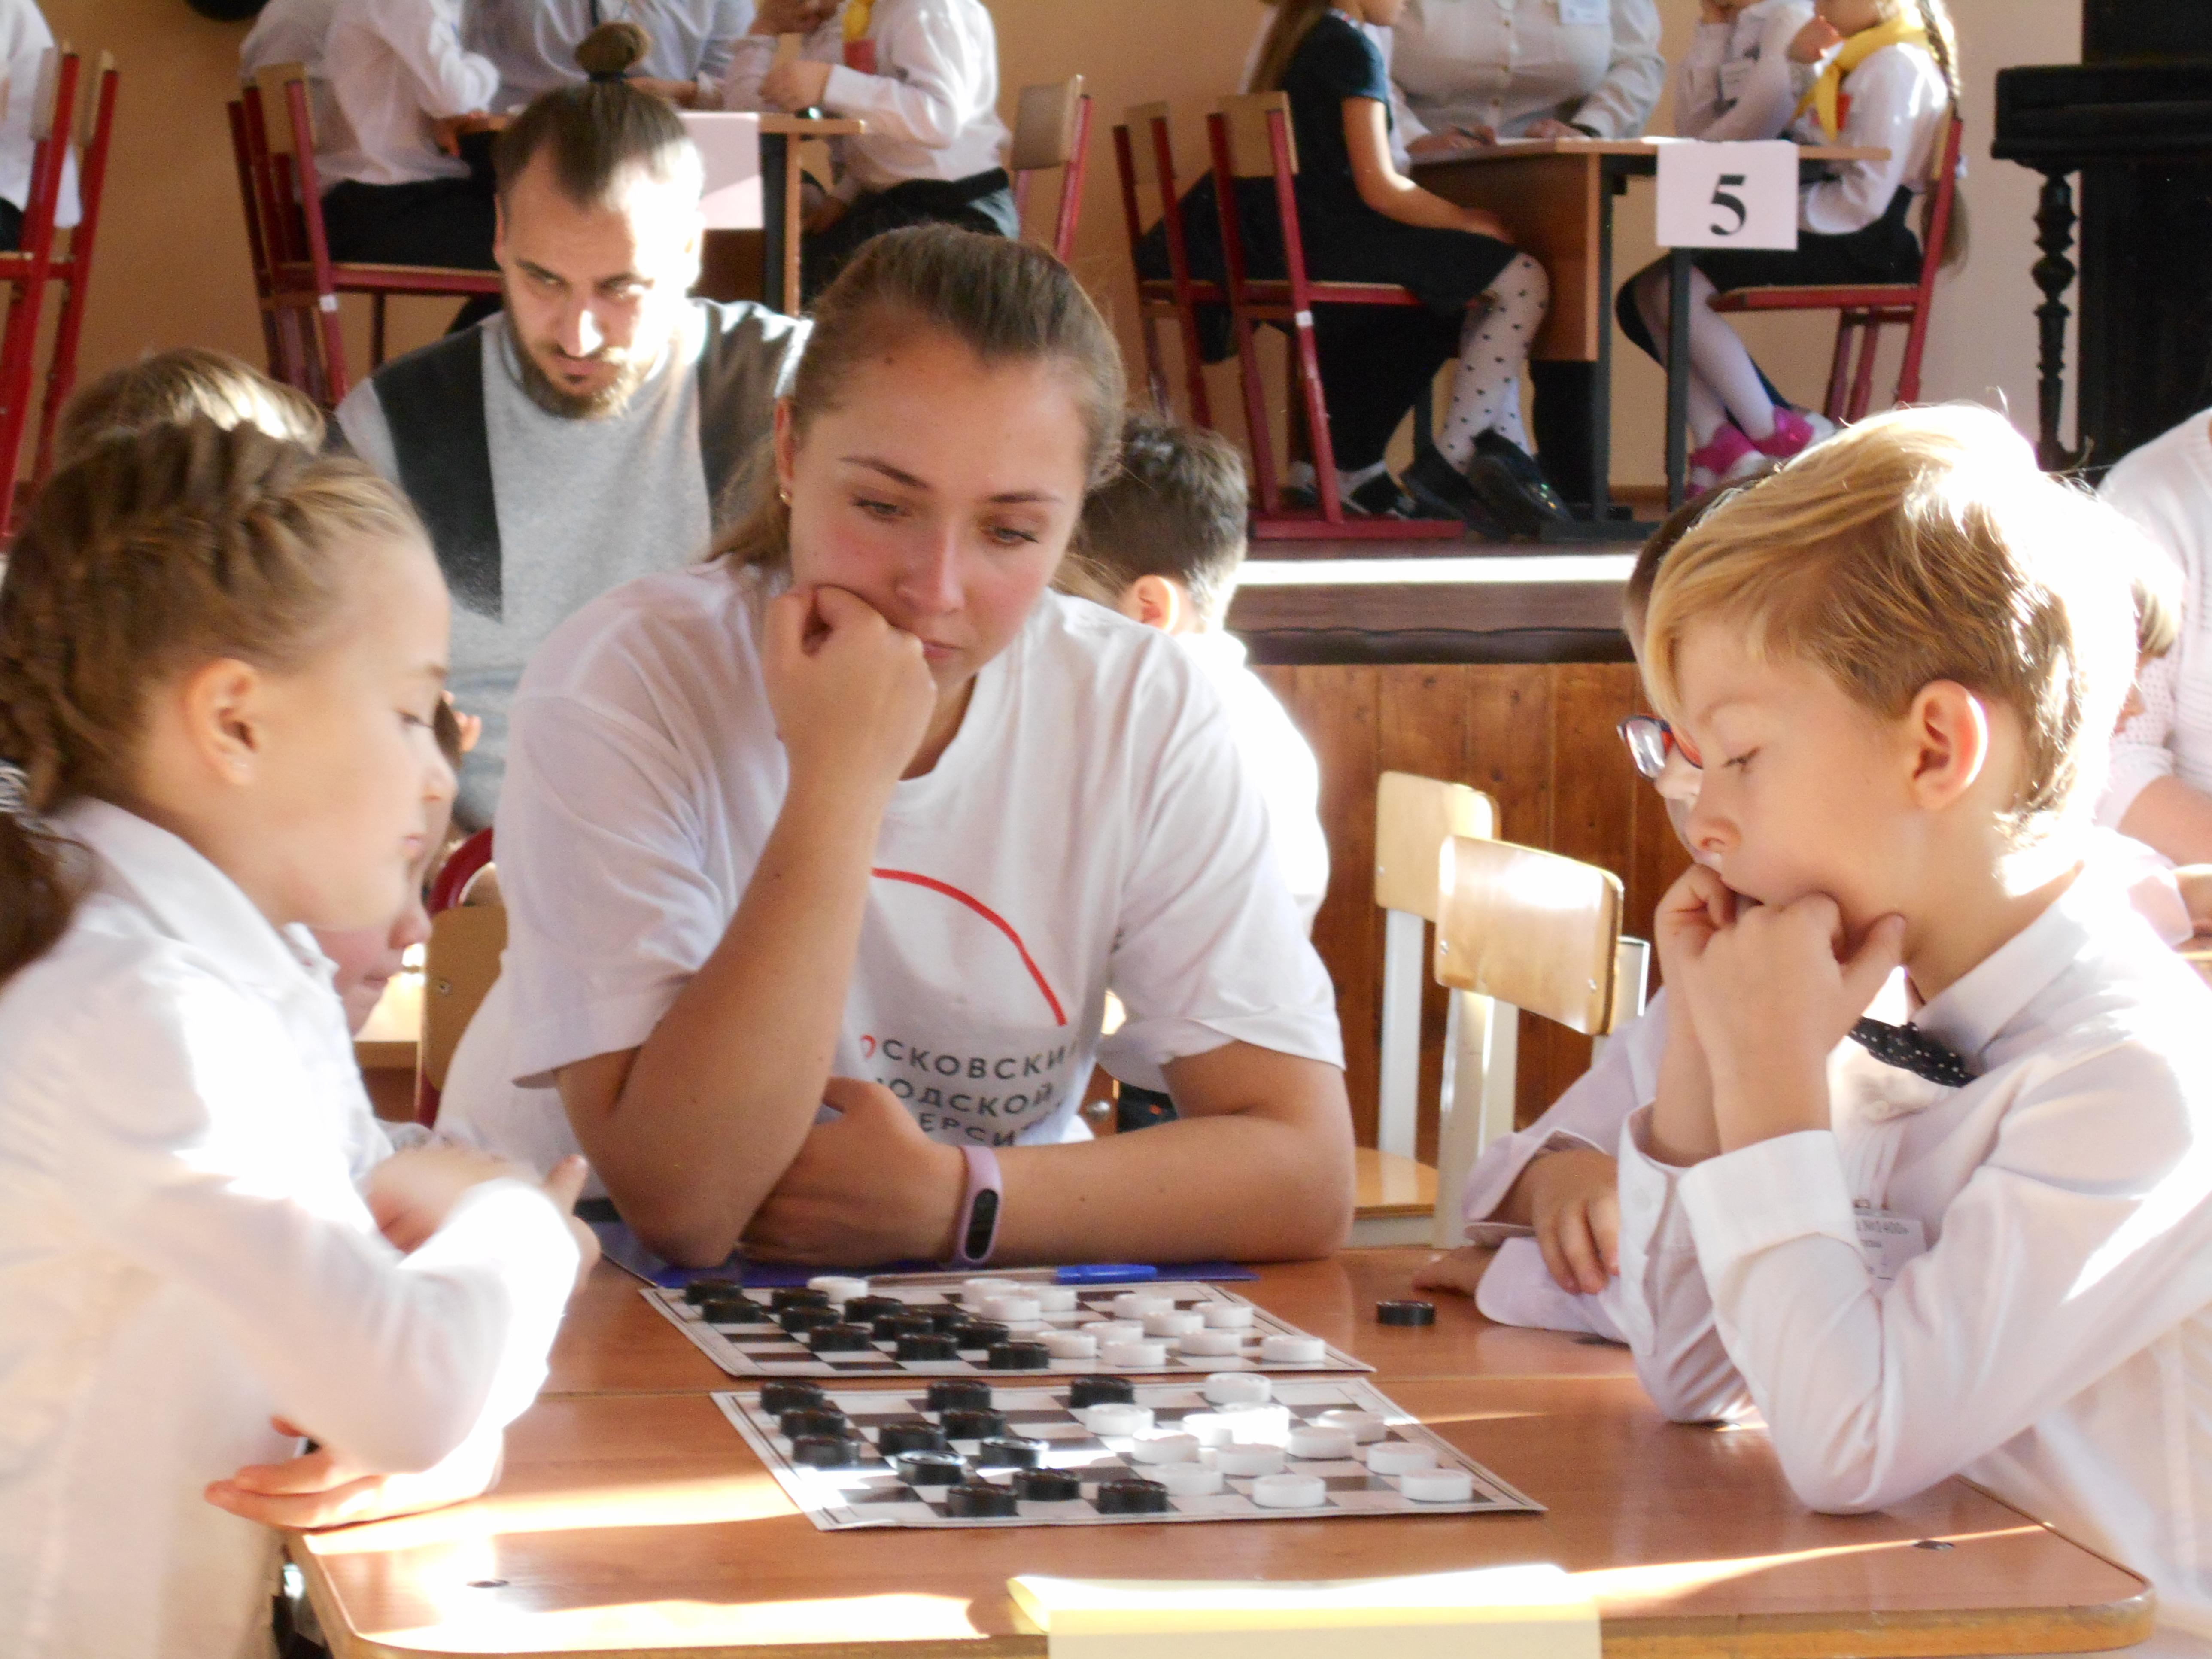 Турнир пошашкам «Юный шашист»